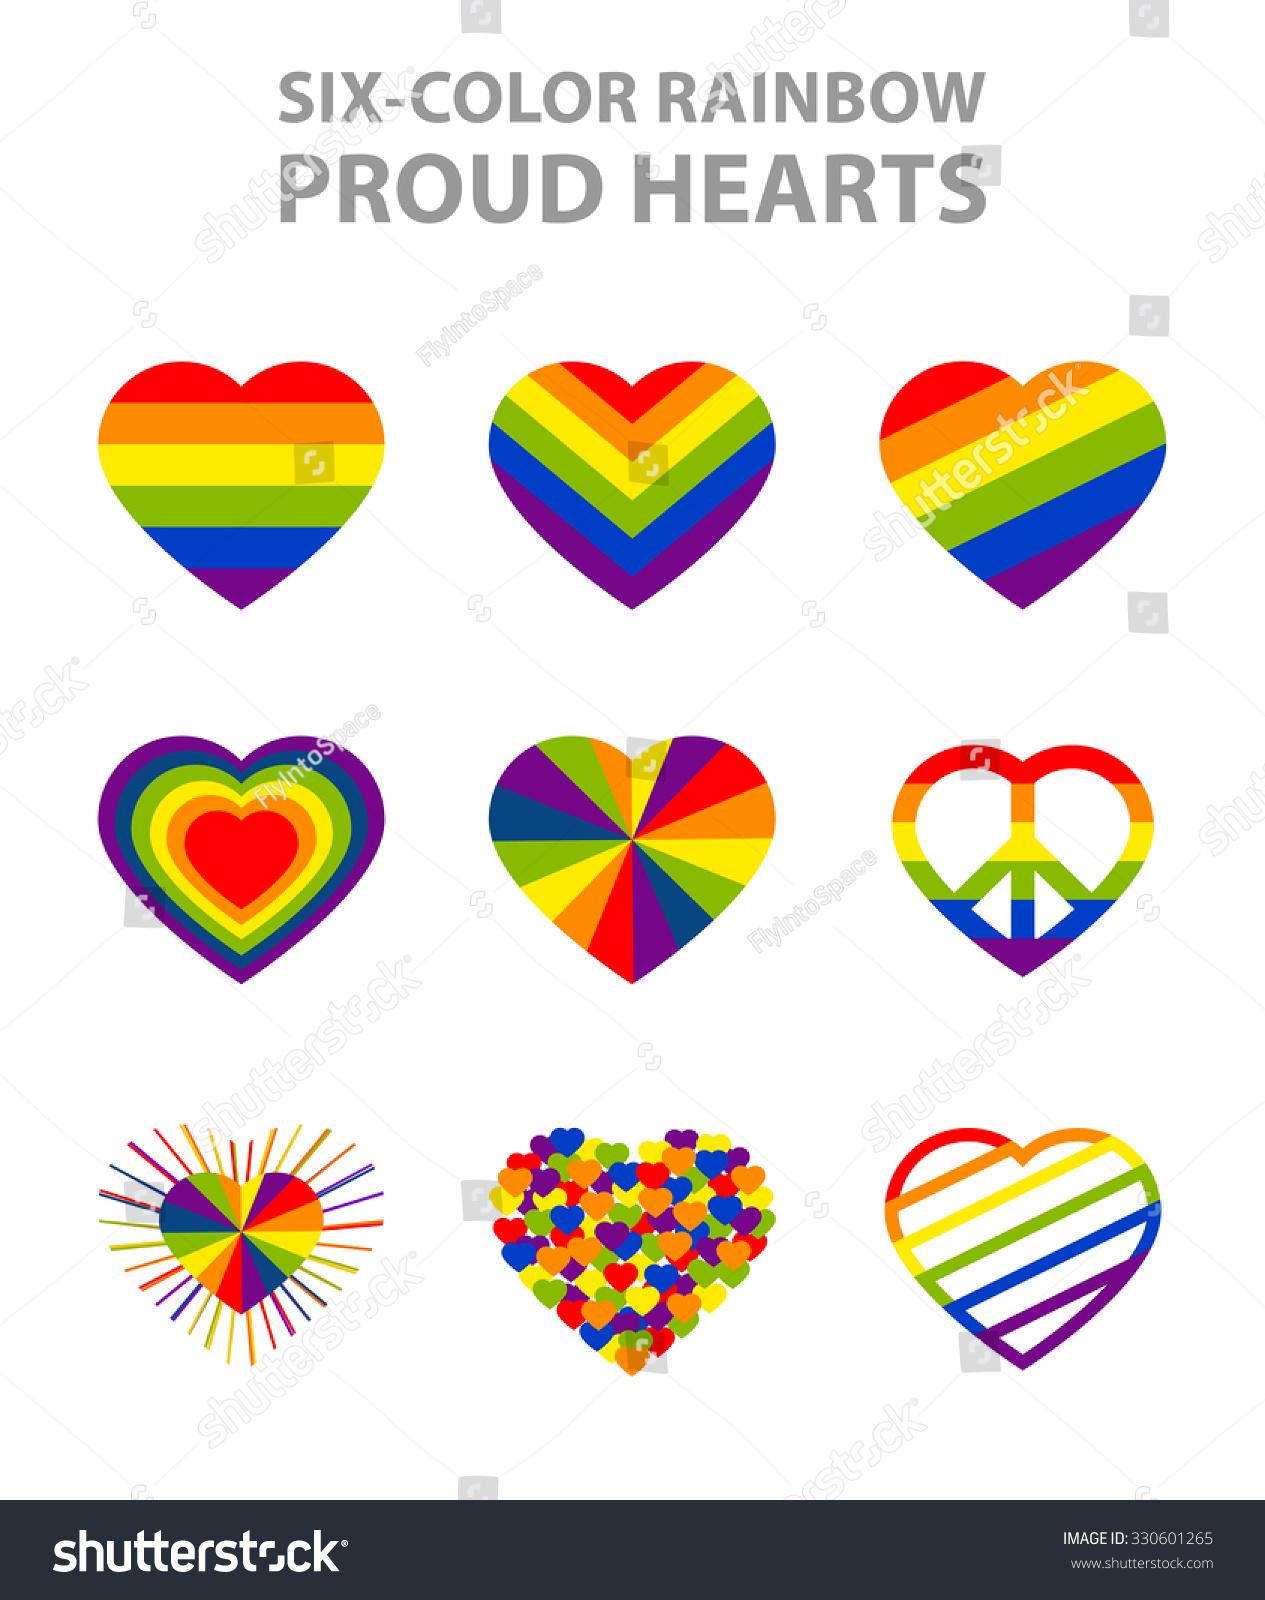 Sixcolor Rainbow Lgbt Symbols Pride Freedom Stock Vector Royalty